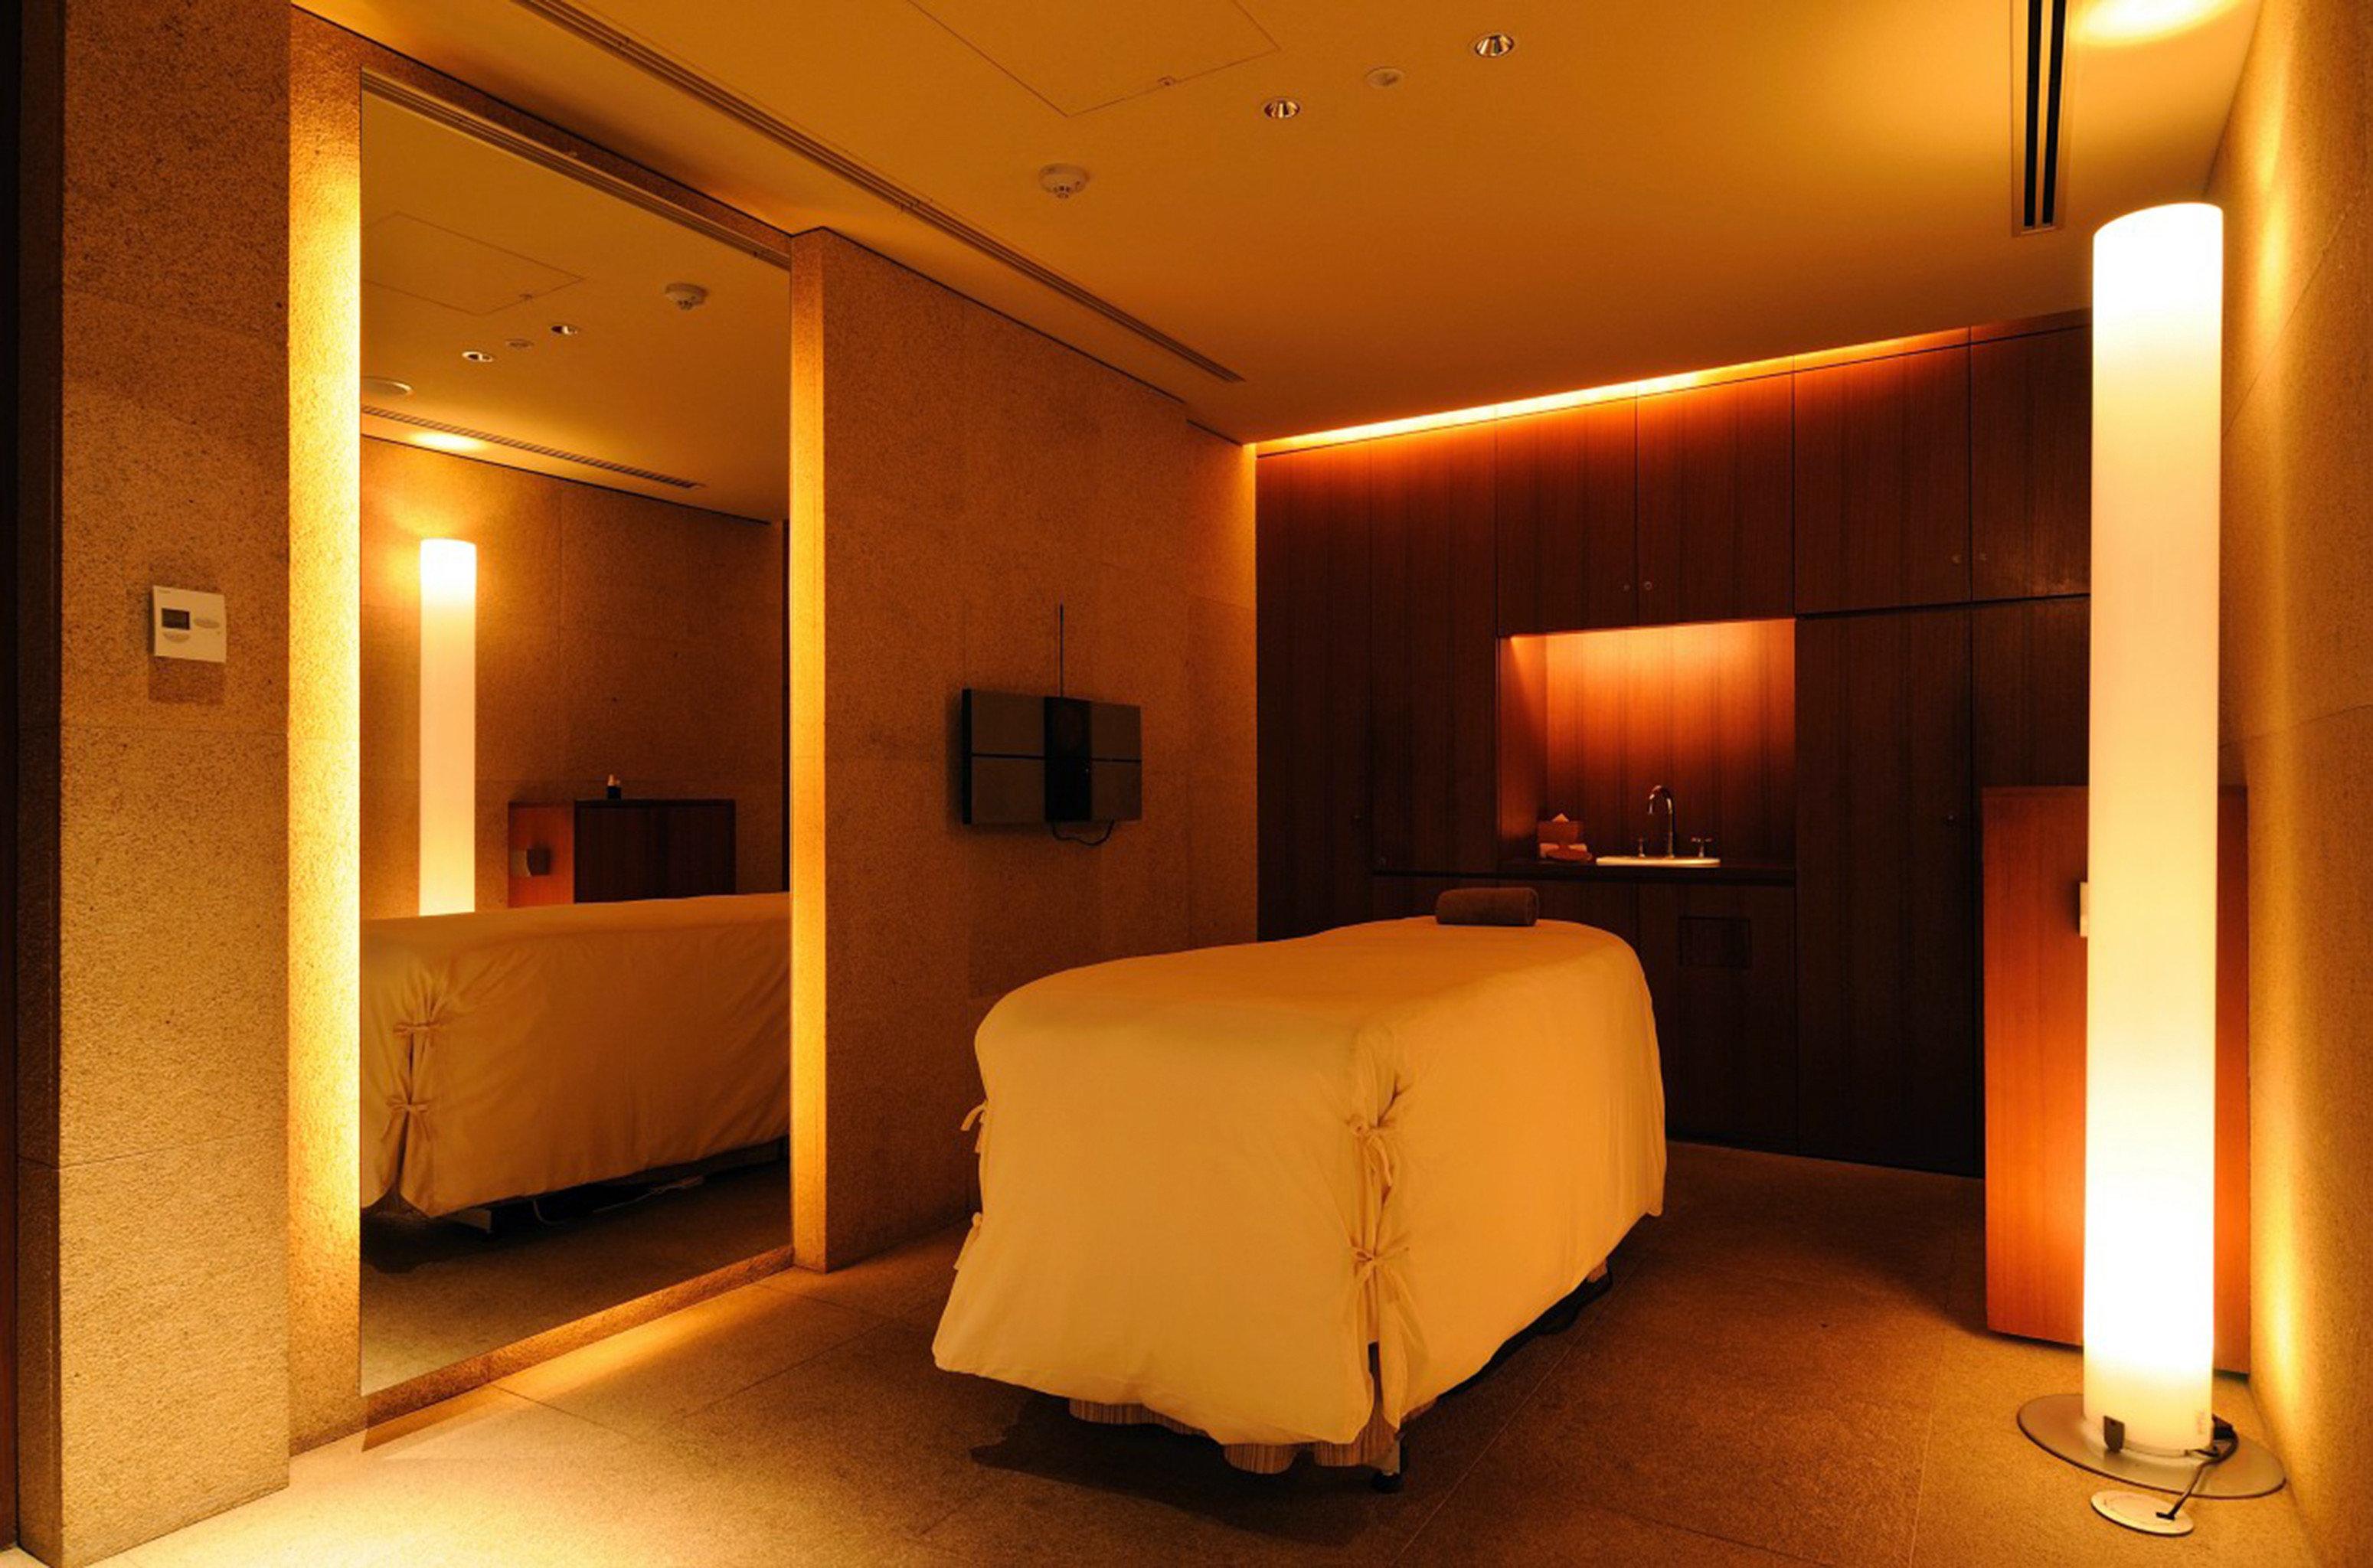 City Modern Spa Wellness property Suite Bedroom lighting orange lamp